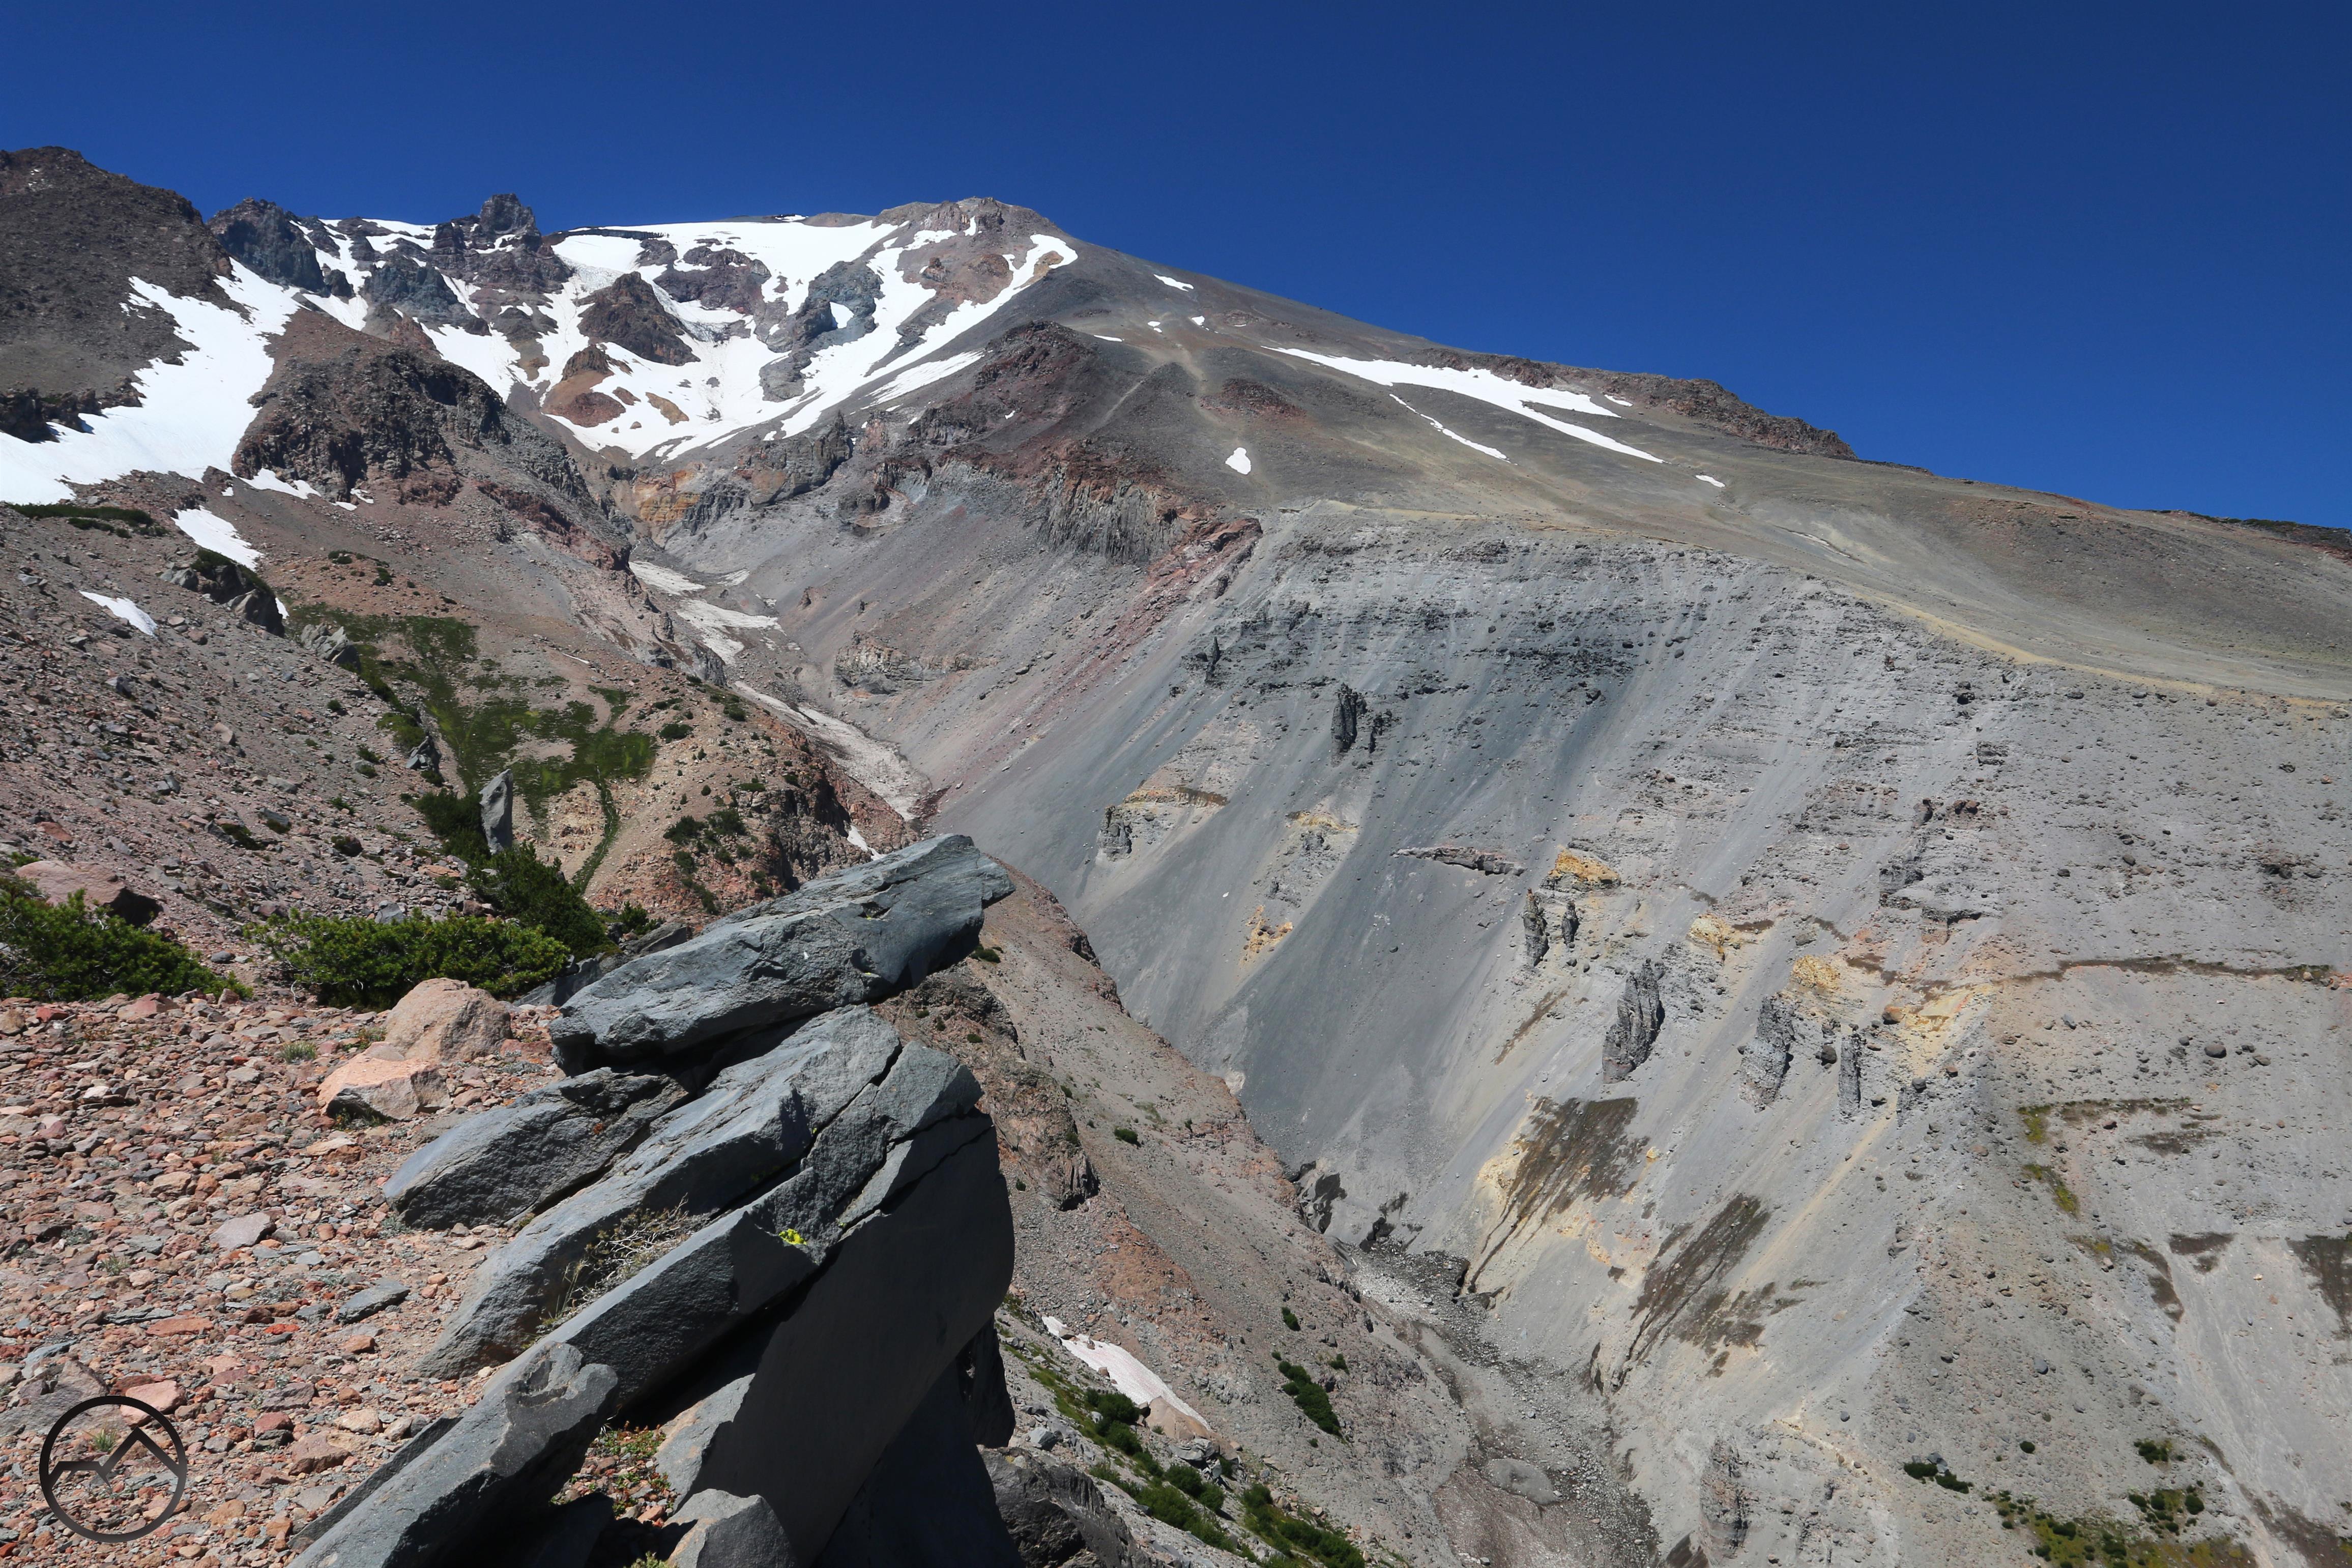 Revisiting Mount Shasta's Hoodoos: A Spectacular, Dynamic